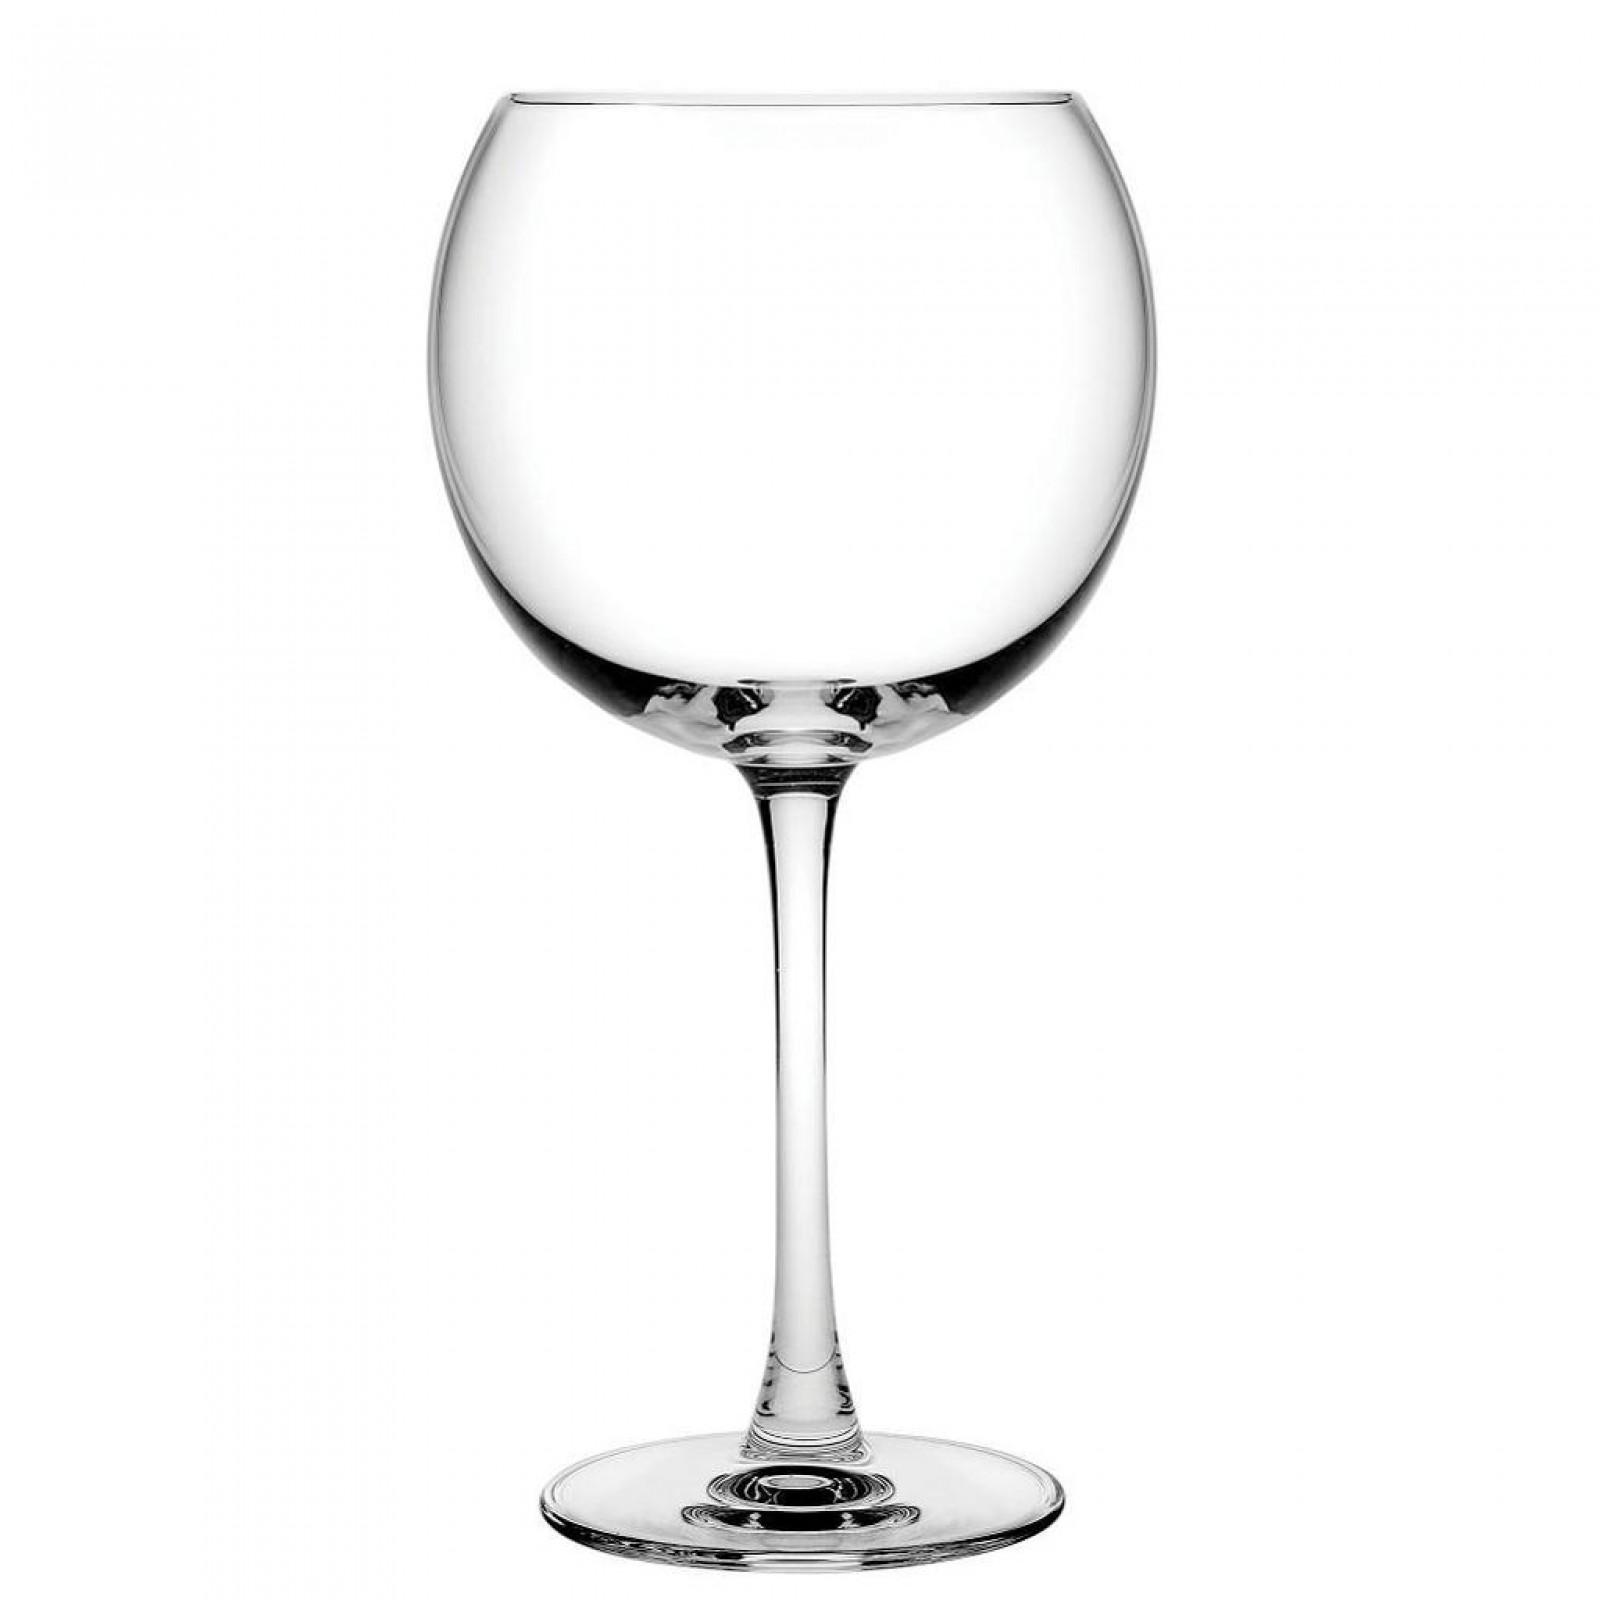 Reserva Red Wine Glasses 700ml (Set of 6) - Nude Glass